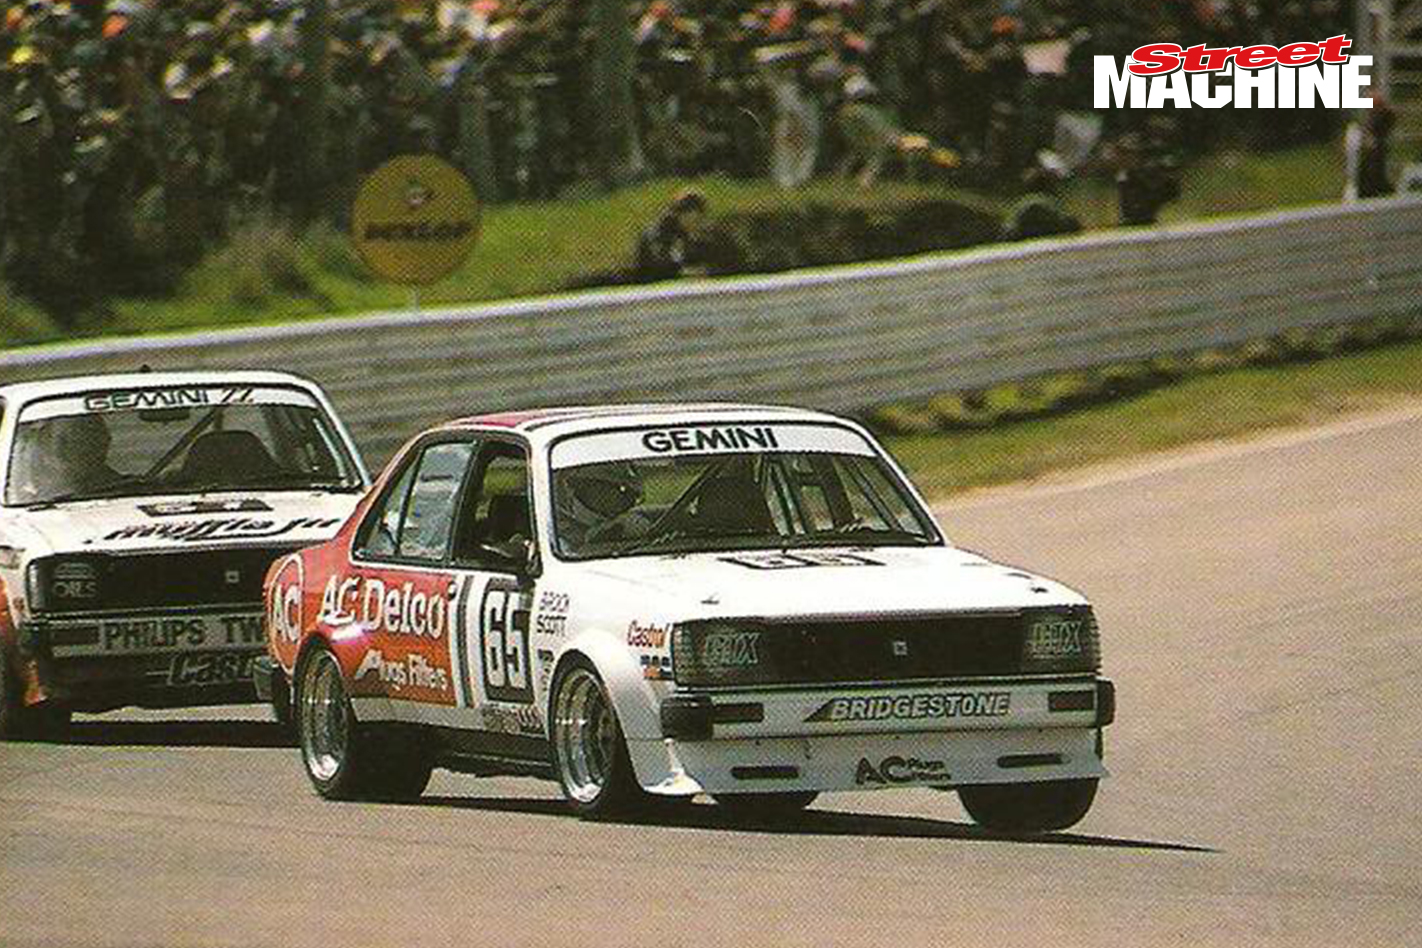 Holden Gemini Bathurst Race Car Nw